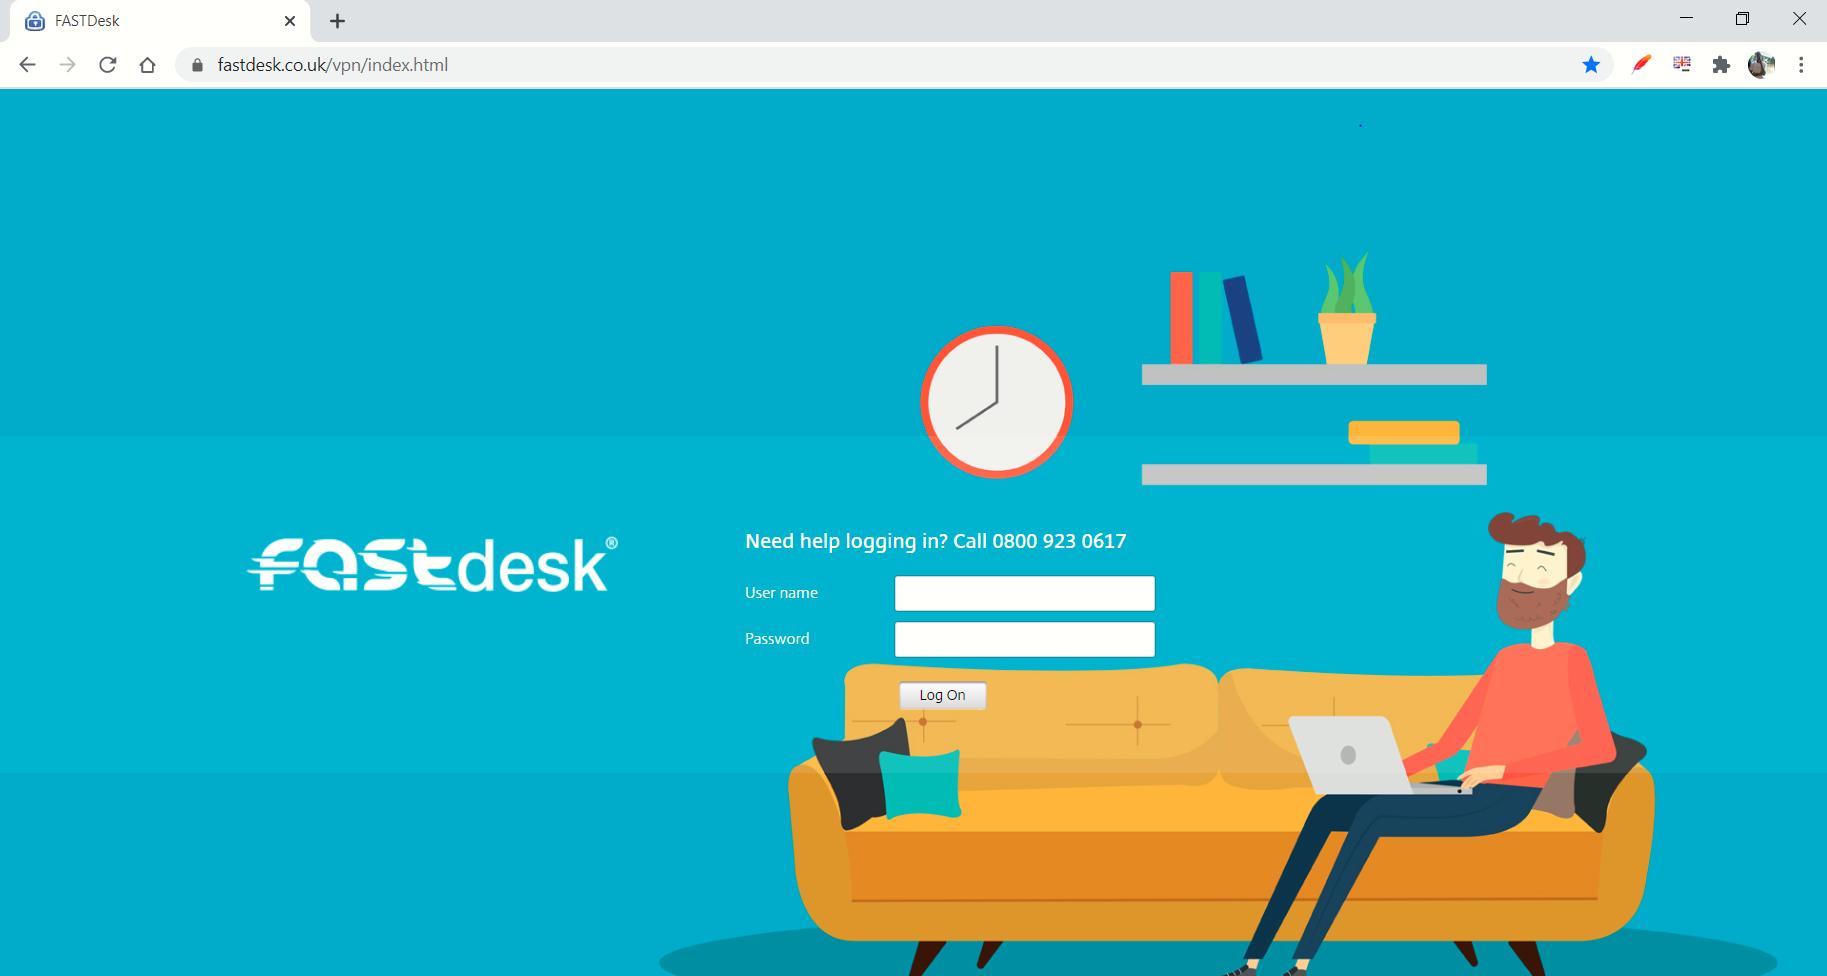 FastDesk screenshot: FastDesk login